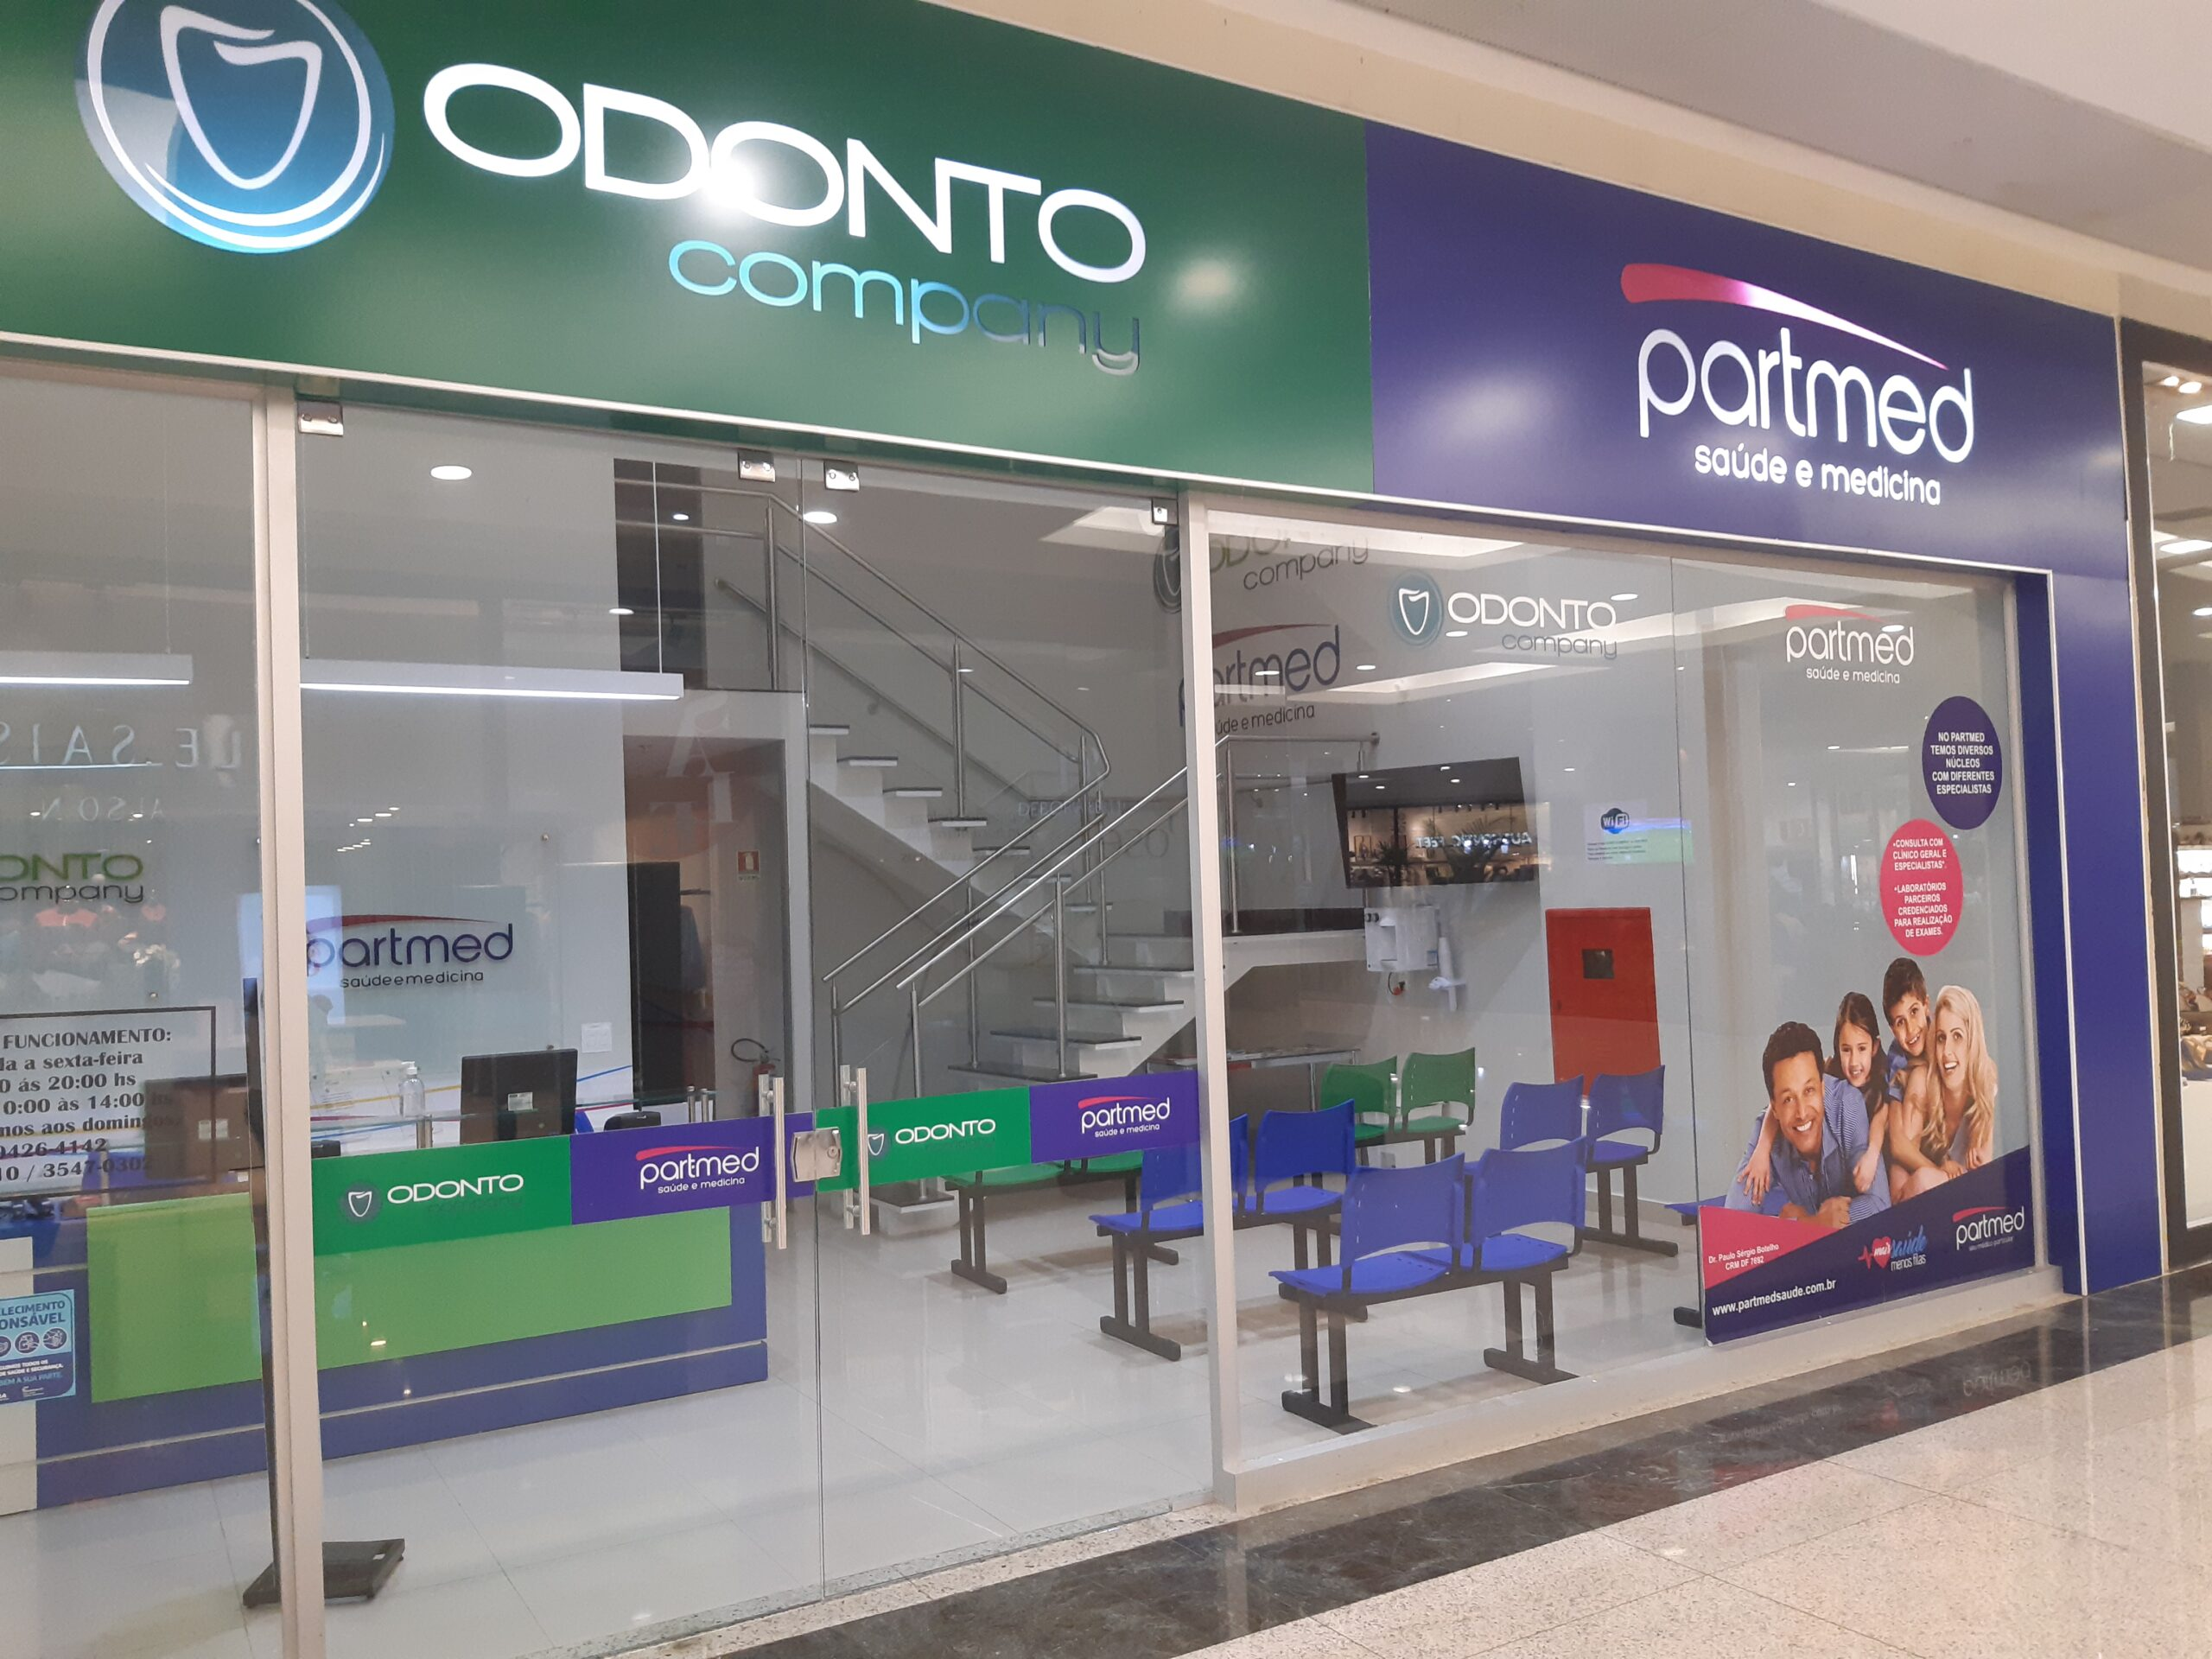 Odonto Company Part Med Taguatinga Shopping, Comércio Brasilia